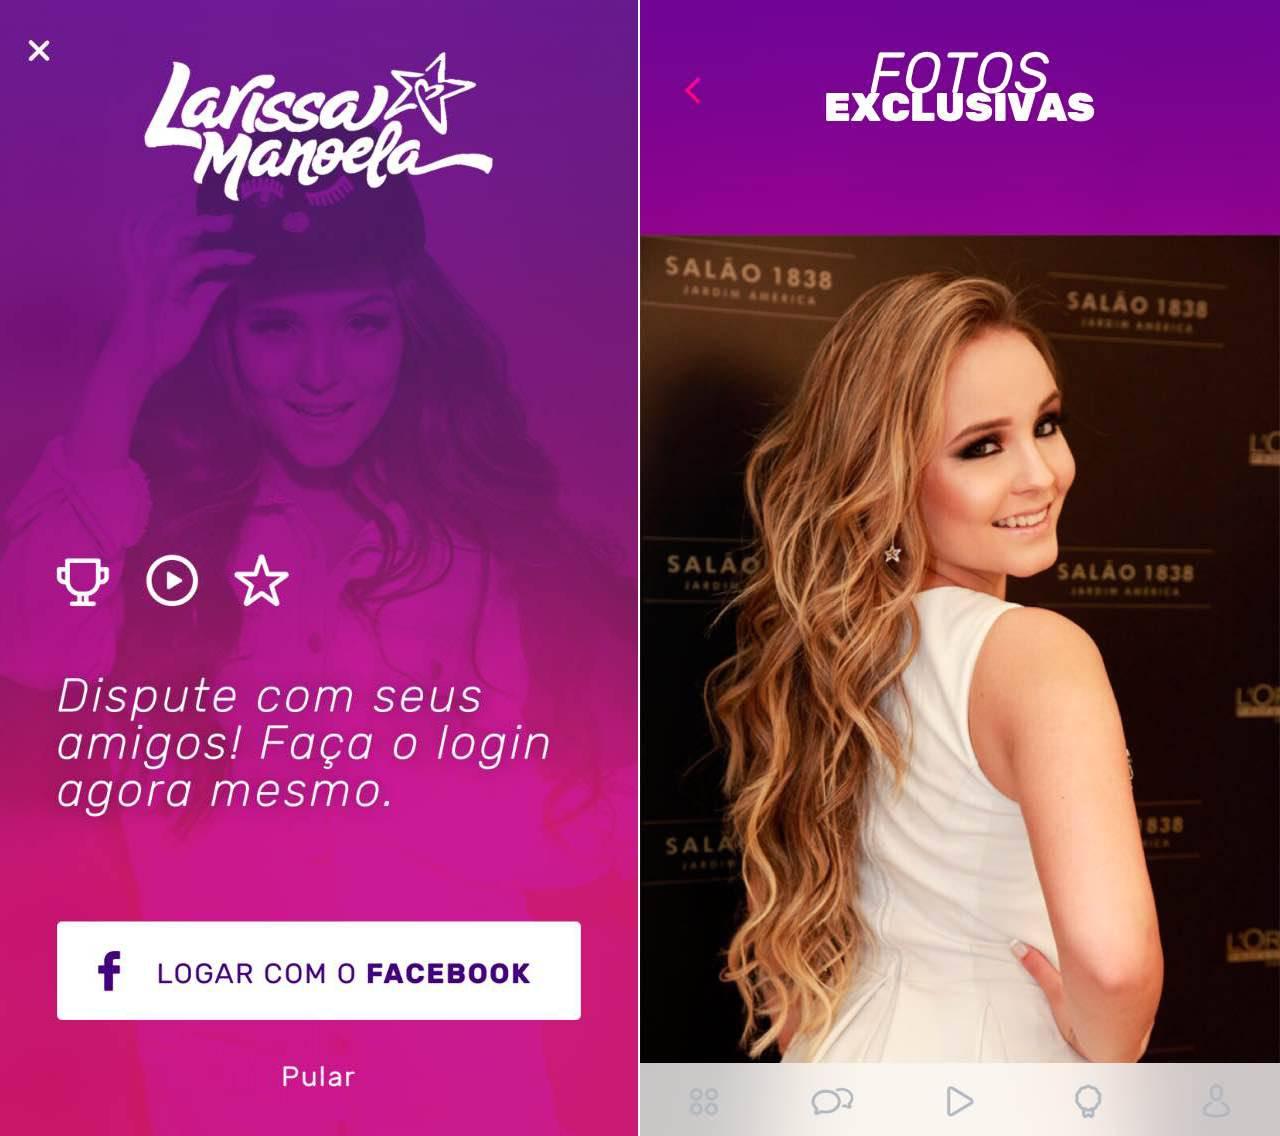 c3d4c792f0f34 Larissa Manoela lança aplicativo para os fãs